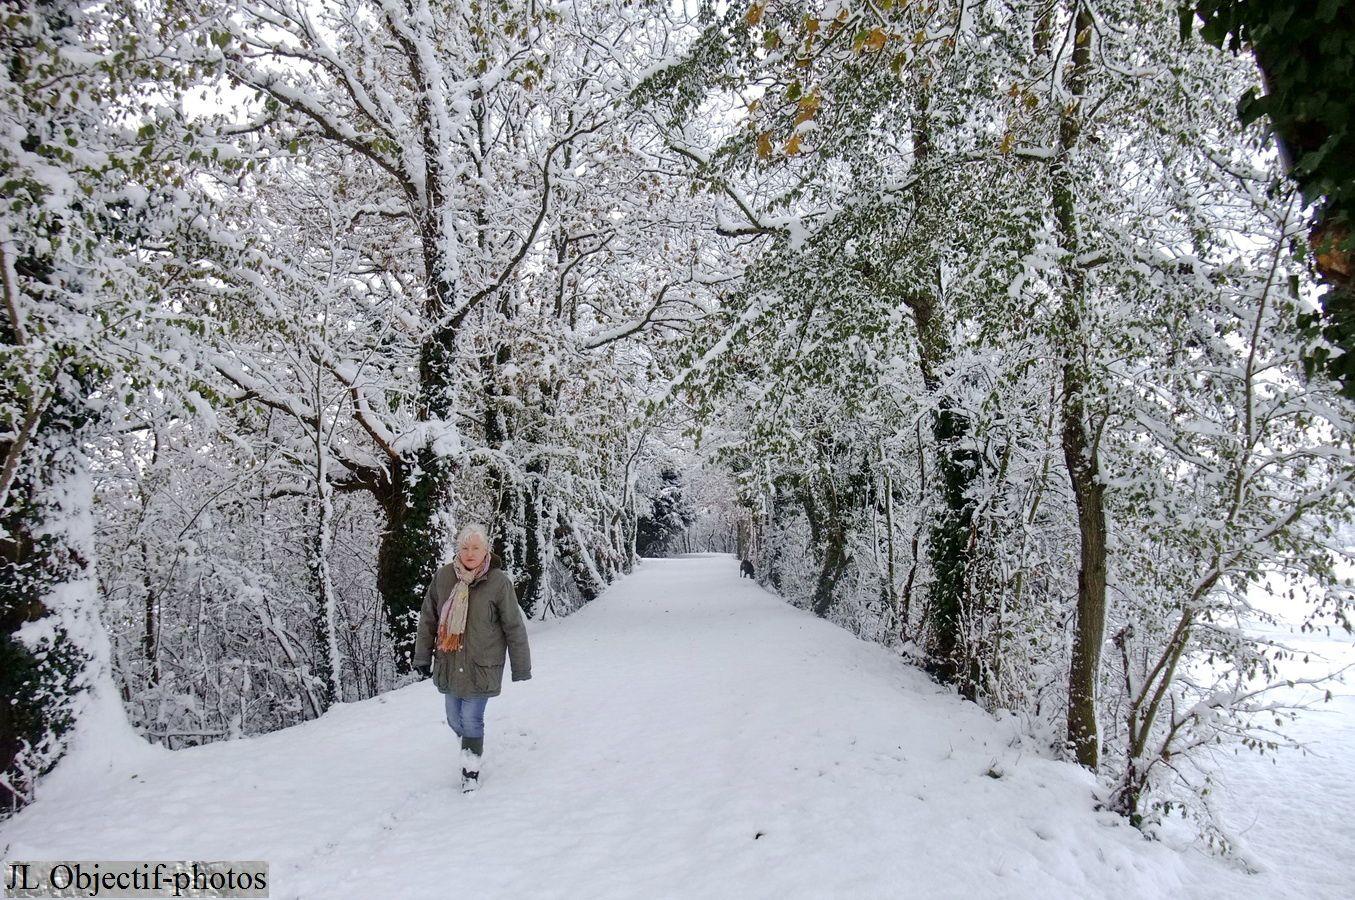 Normandie, Manche, Quettreville-sur-Sienne, Trelly, neige 03-12-2010, photo Normandy, Manche, Basse Normandie,France